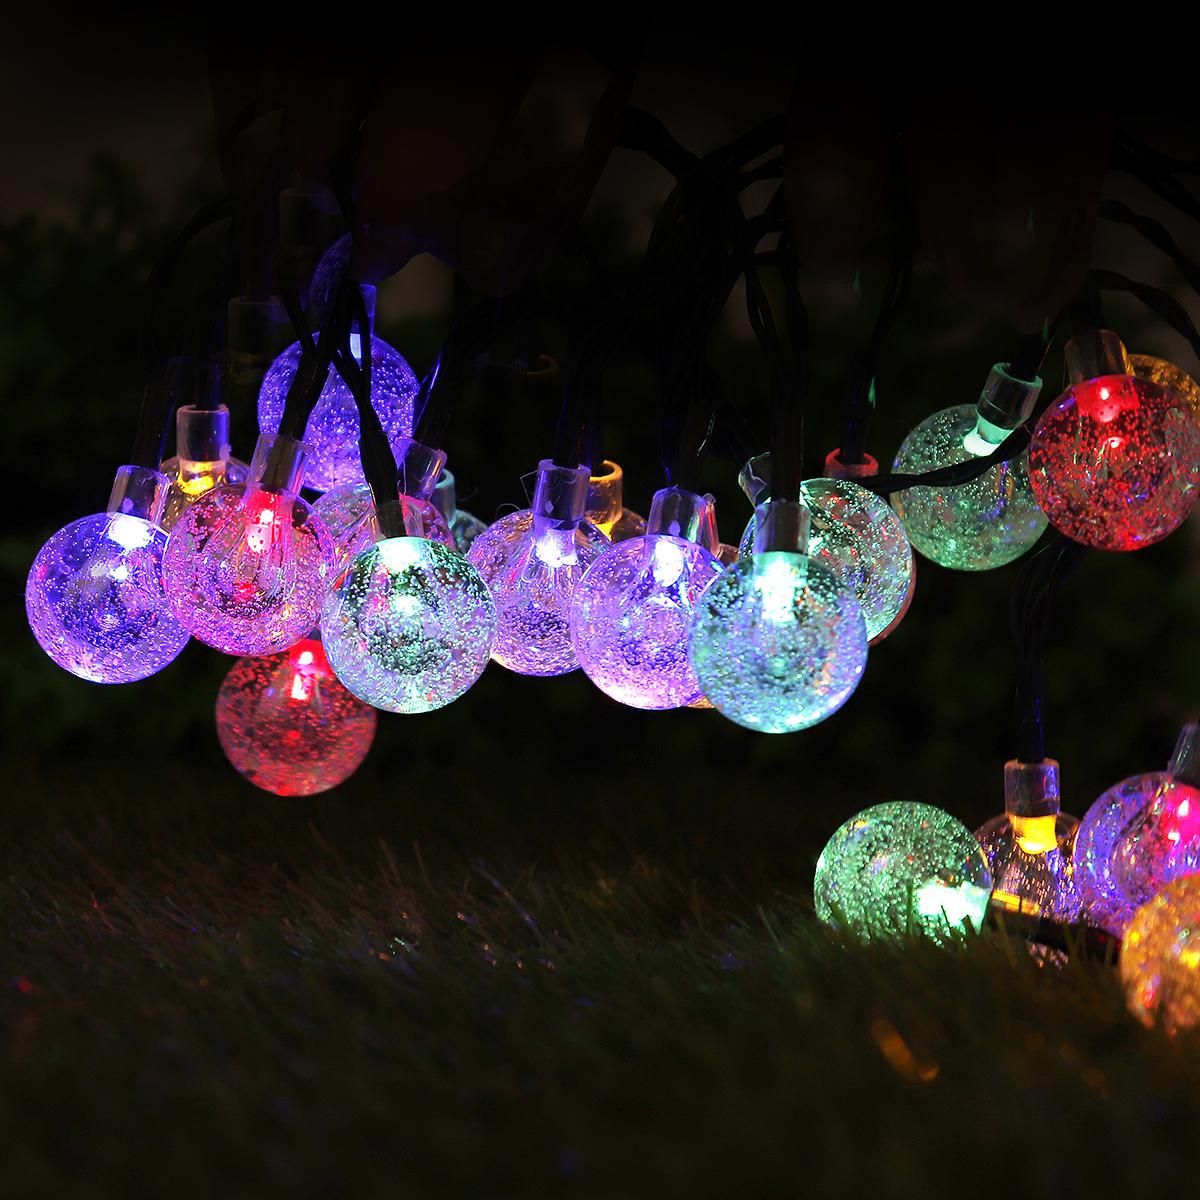 Outdoor Solar Power 50 LED String Light Garden Decor Landscape Waterproof Lamp